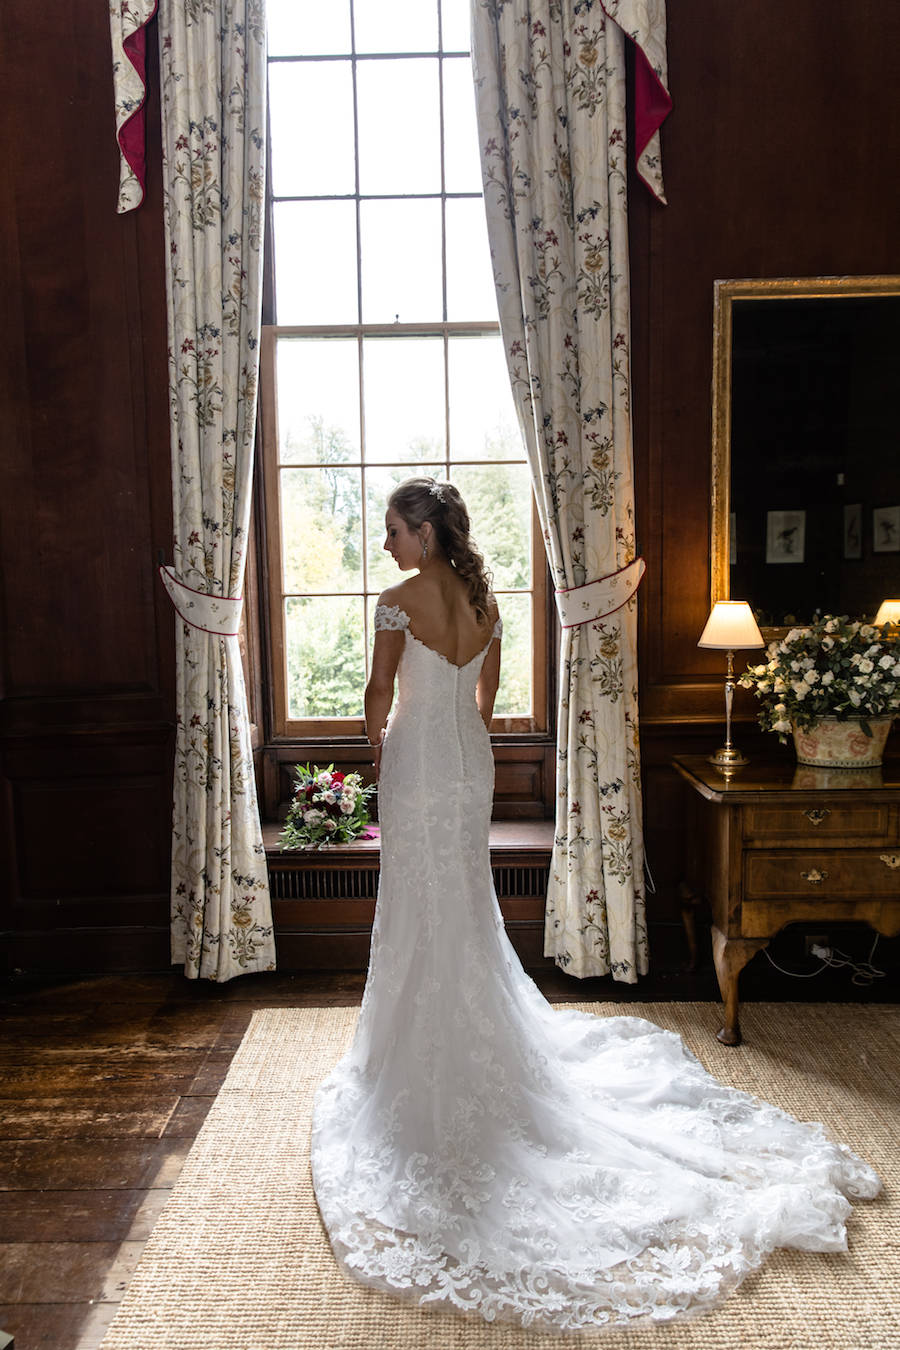 Glemham Hall wedding photographer Ayshea Goldberg on English-Wedding.com (9)